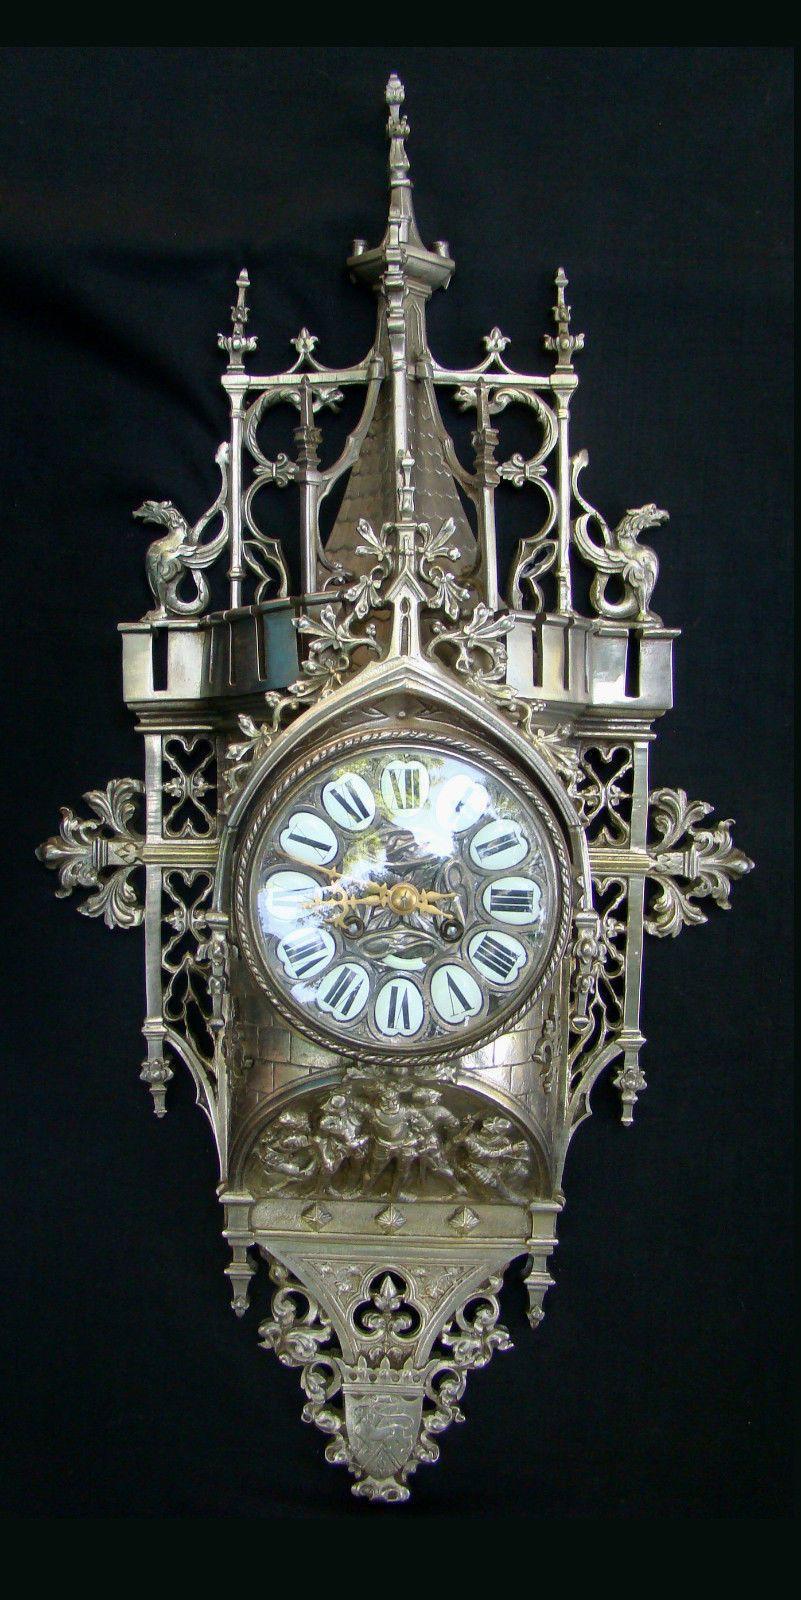 Antique Gothic Grandfather Clocks